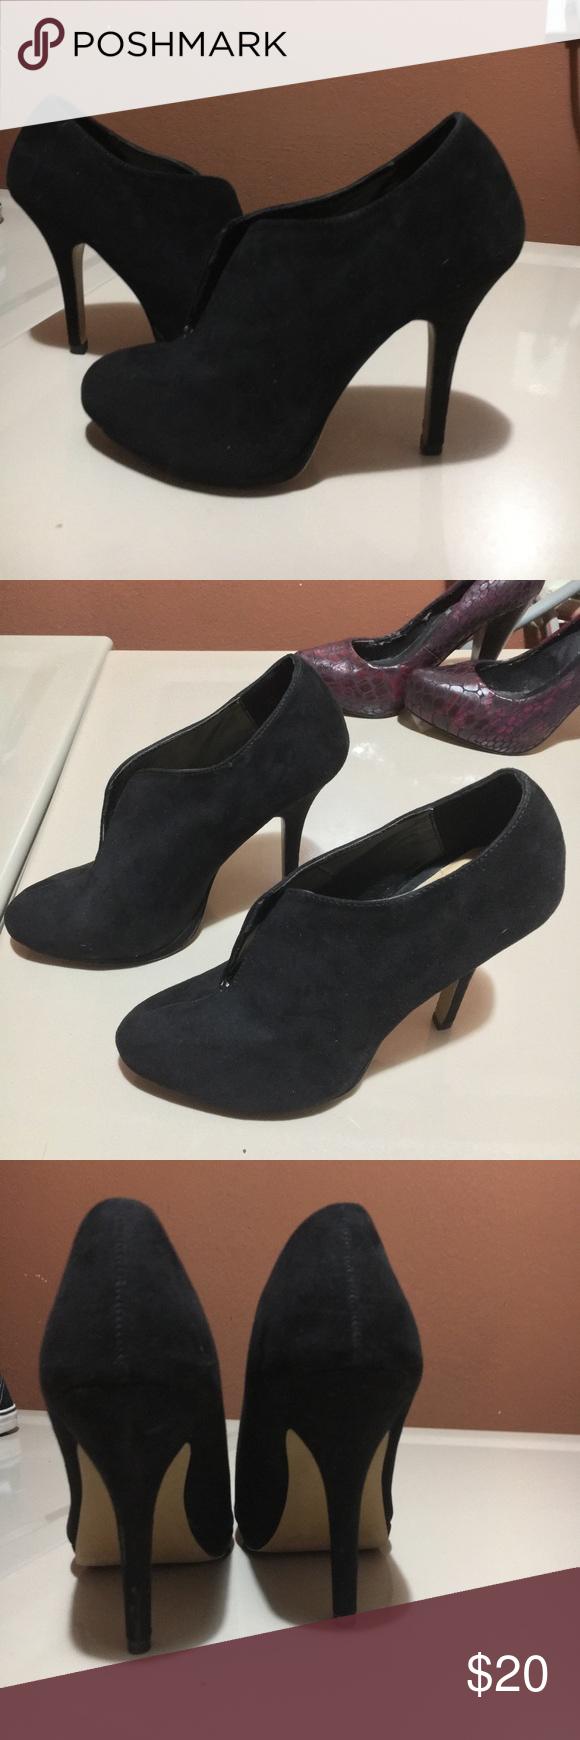 Apt. 9 black suede heels. About 3 inch